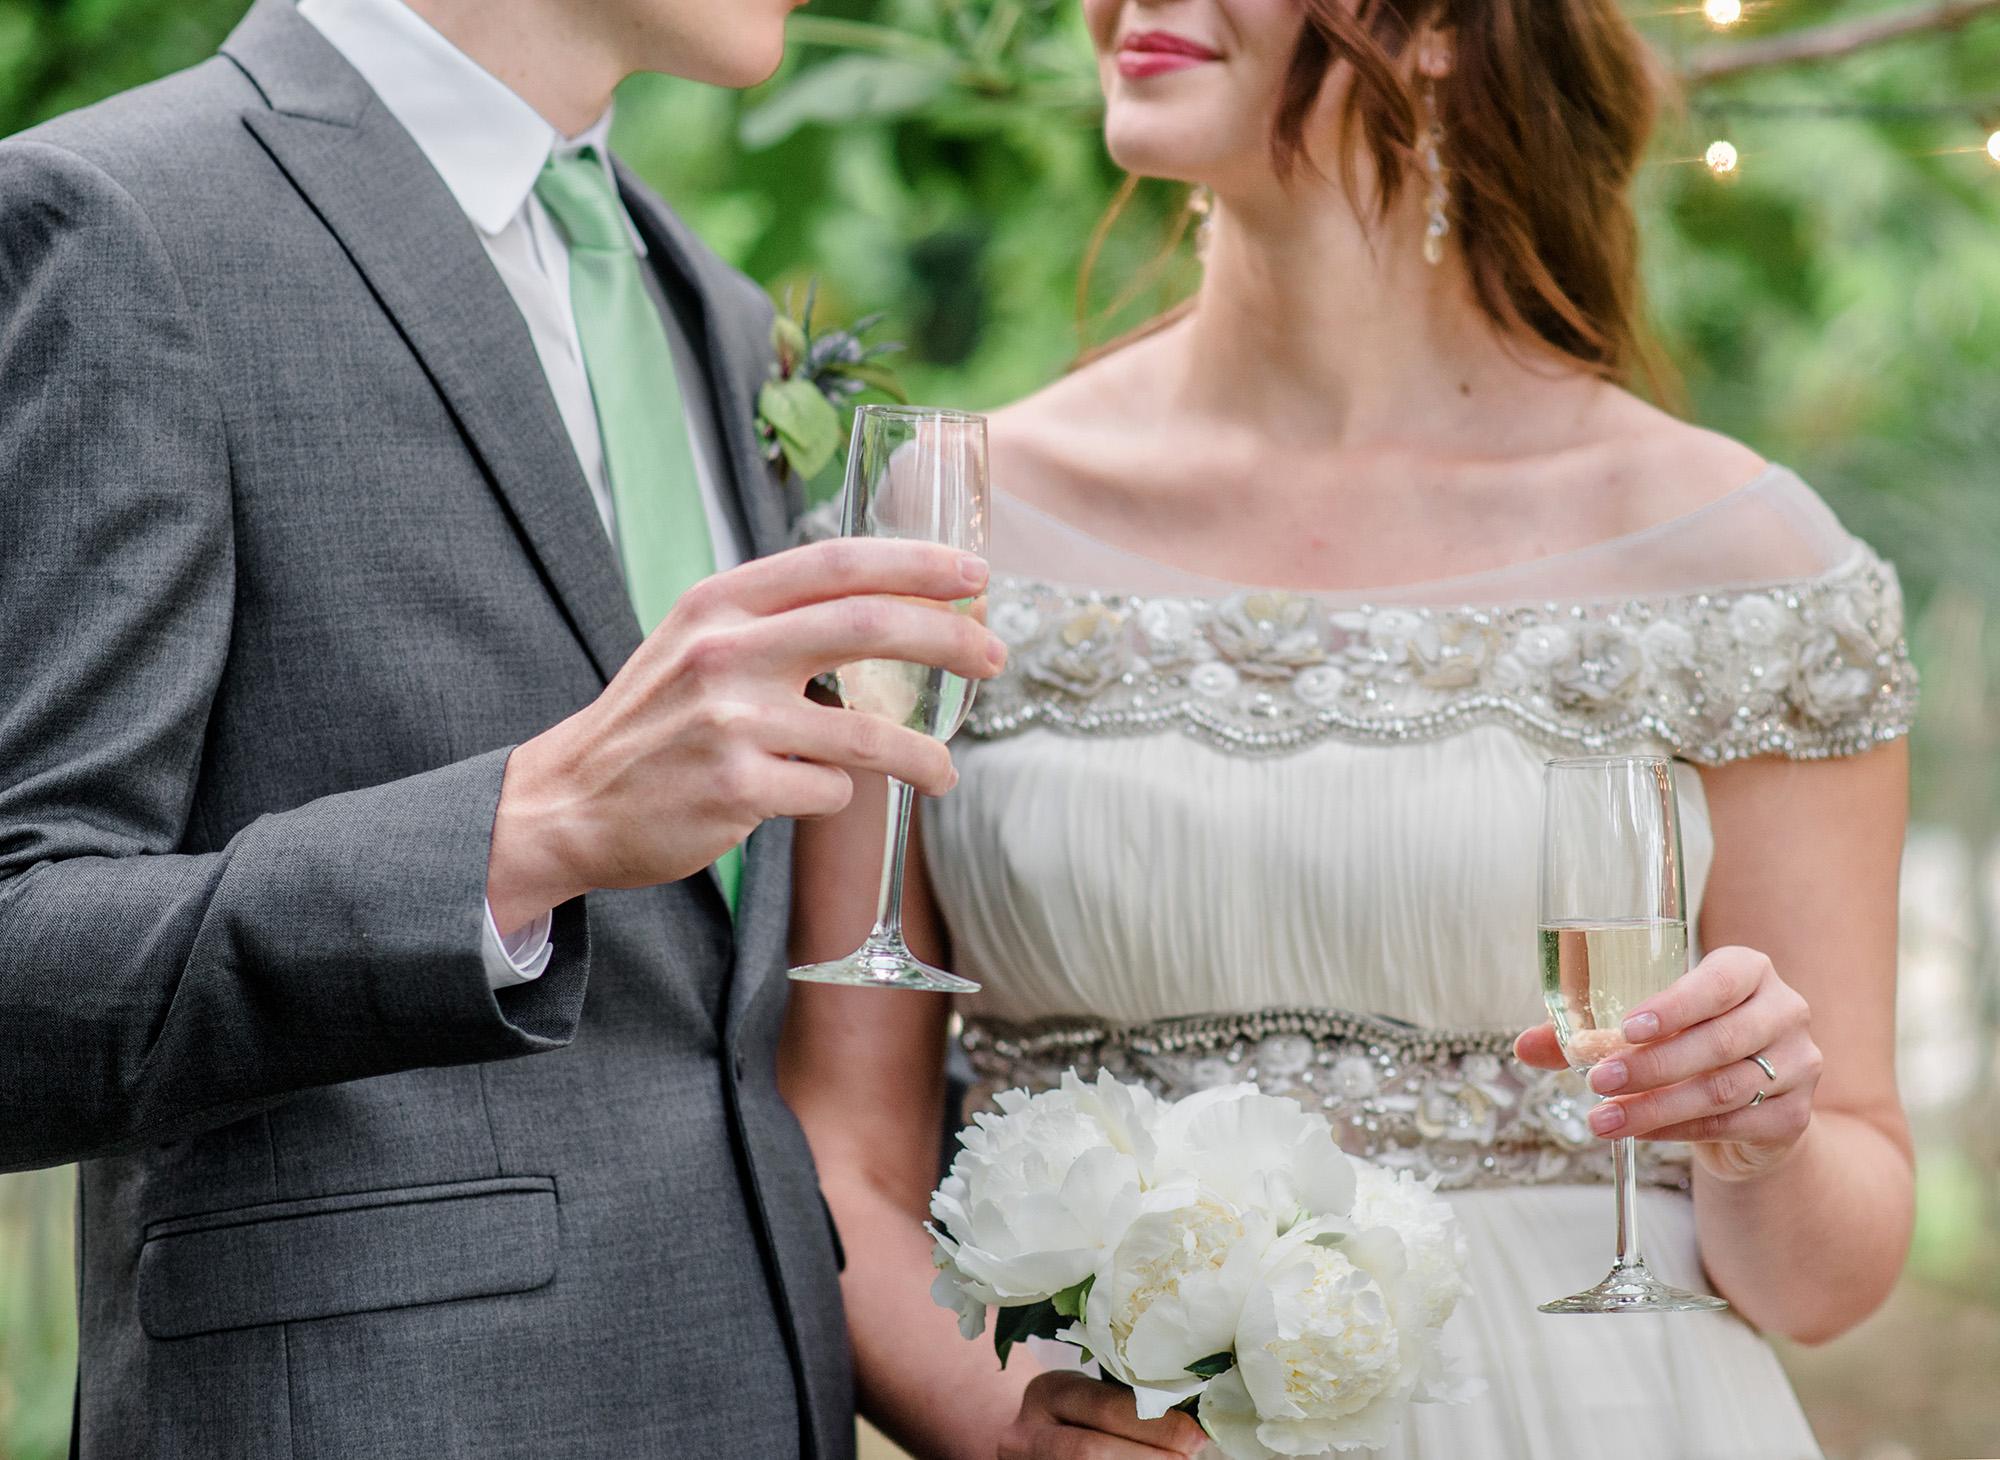 christmas-house-weddings-receptions-carrie-vines-073.jpg